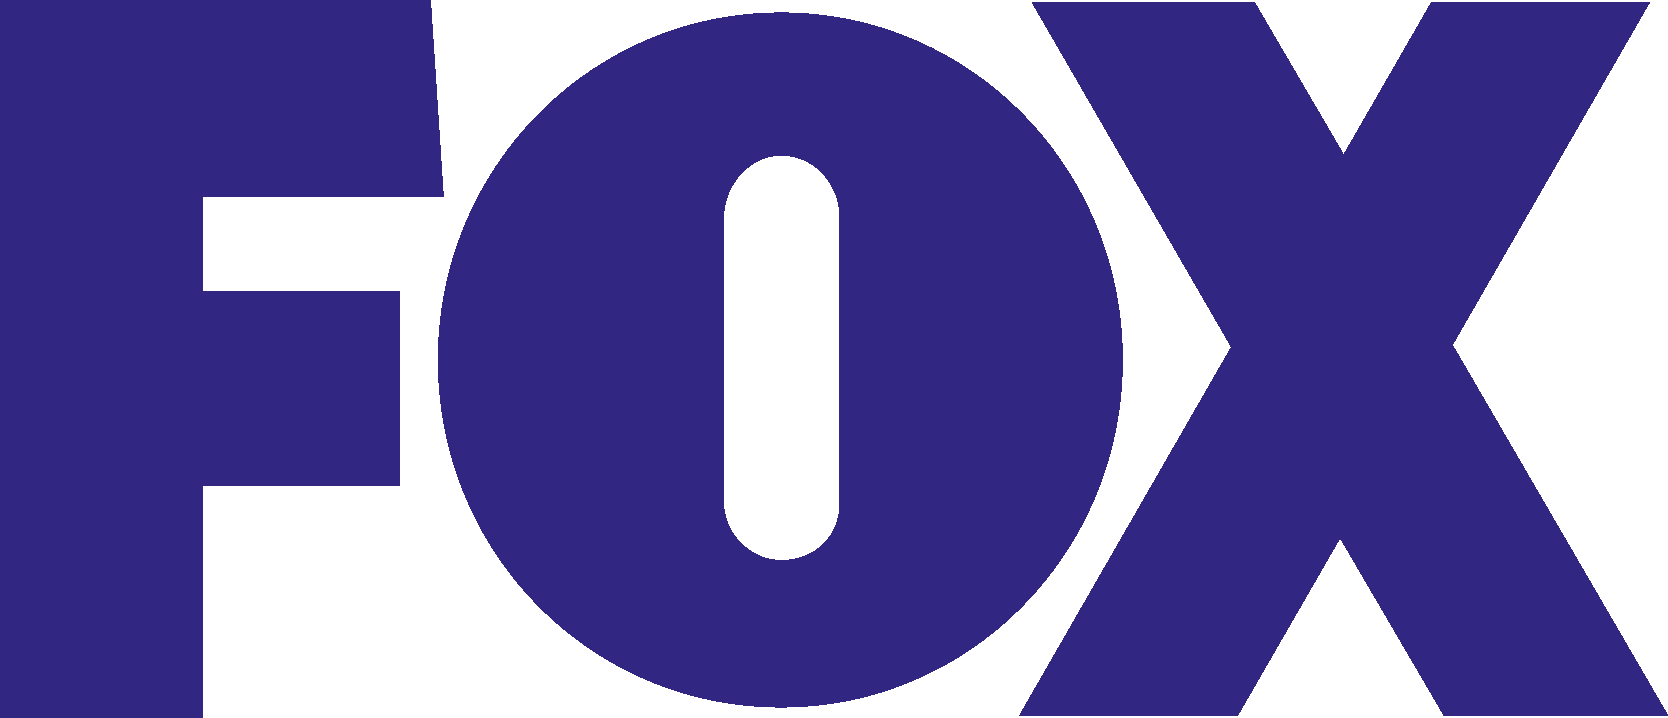 Fox Tv Logo png